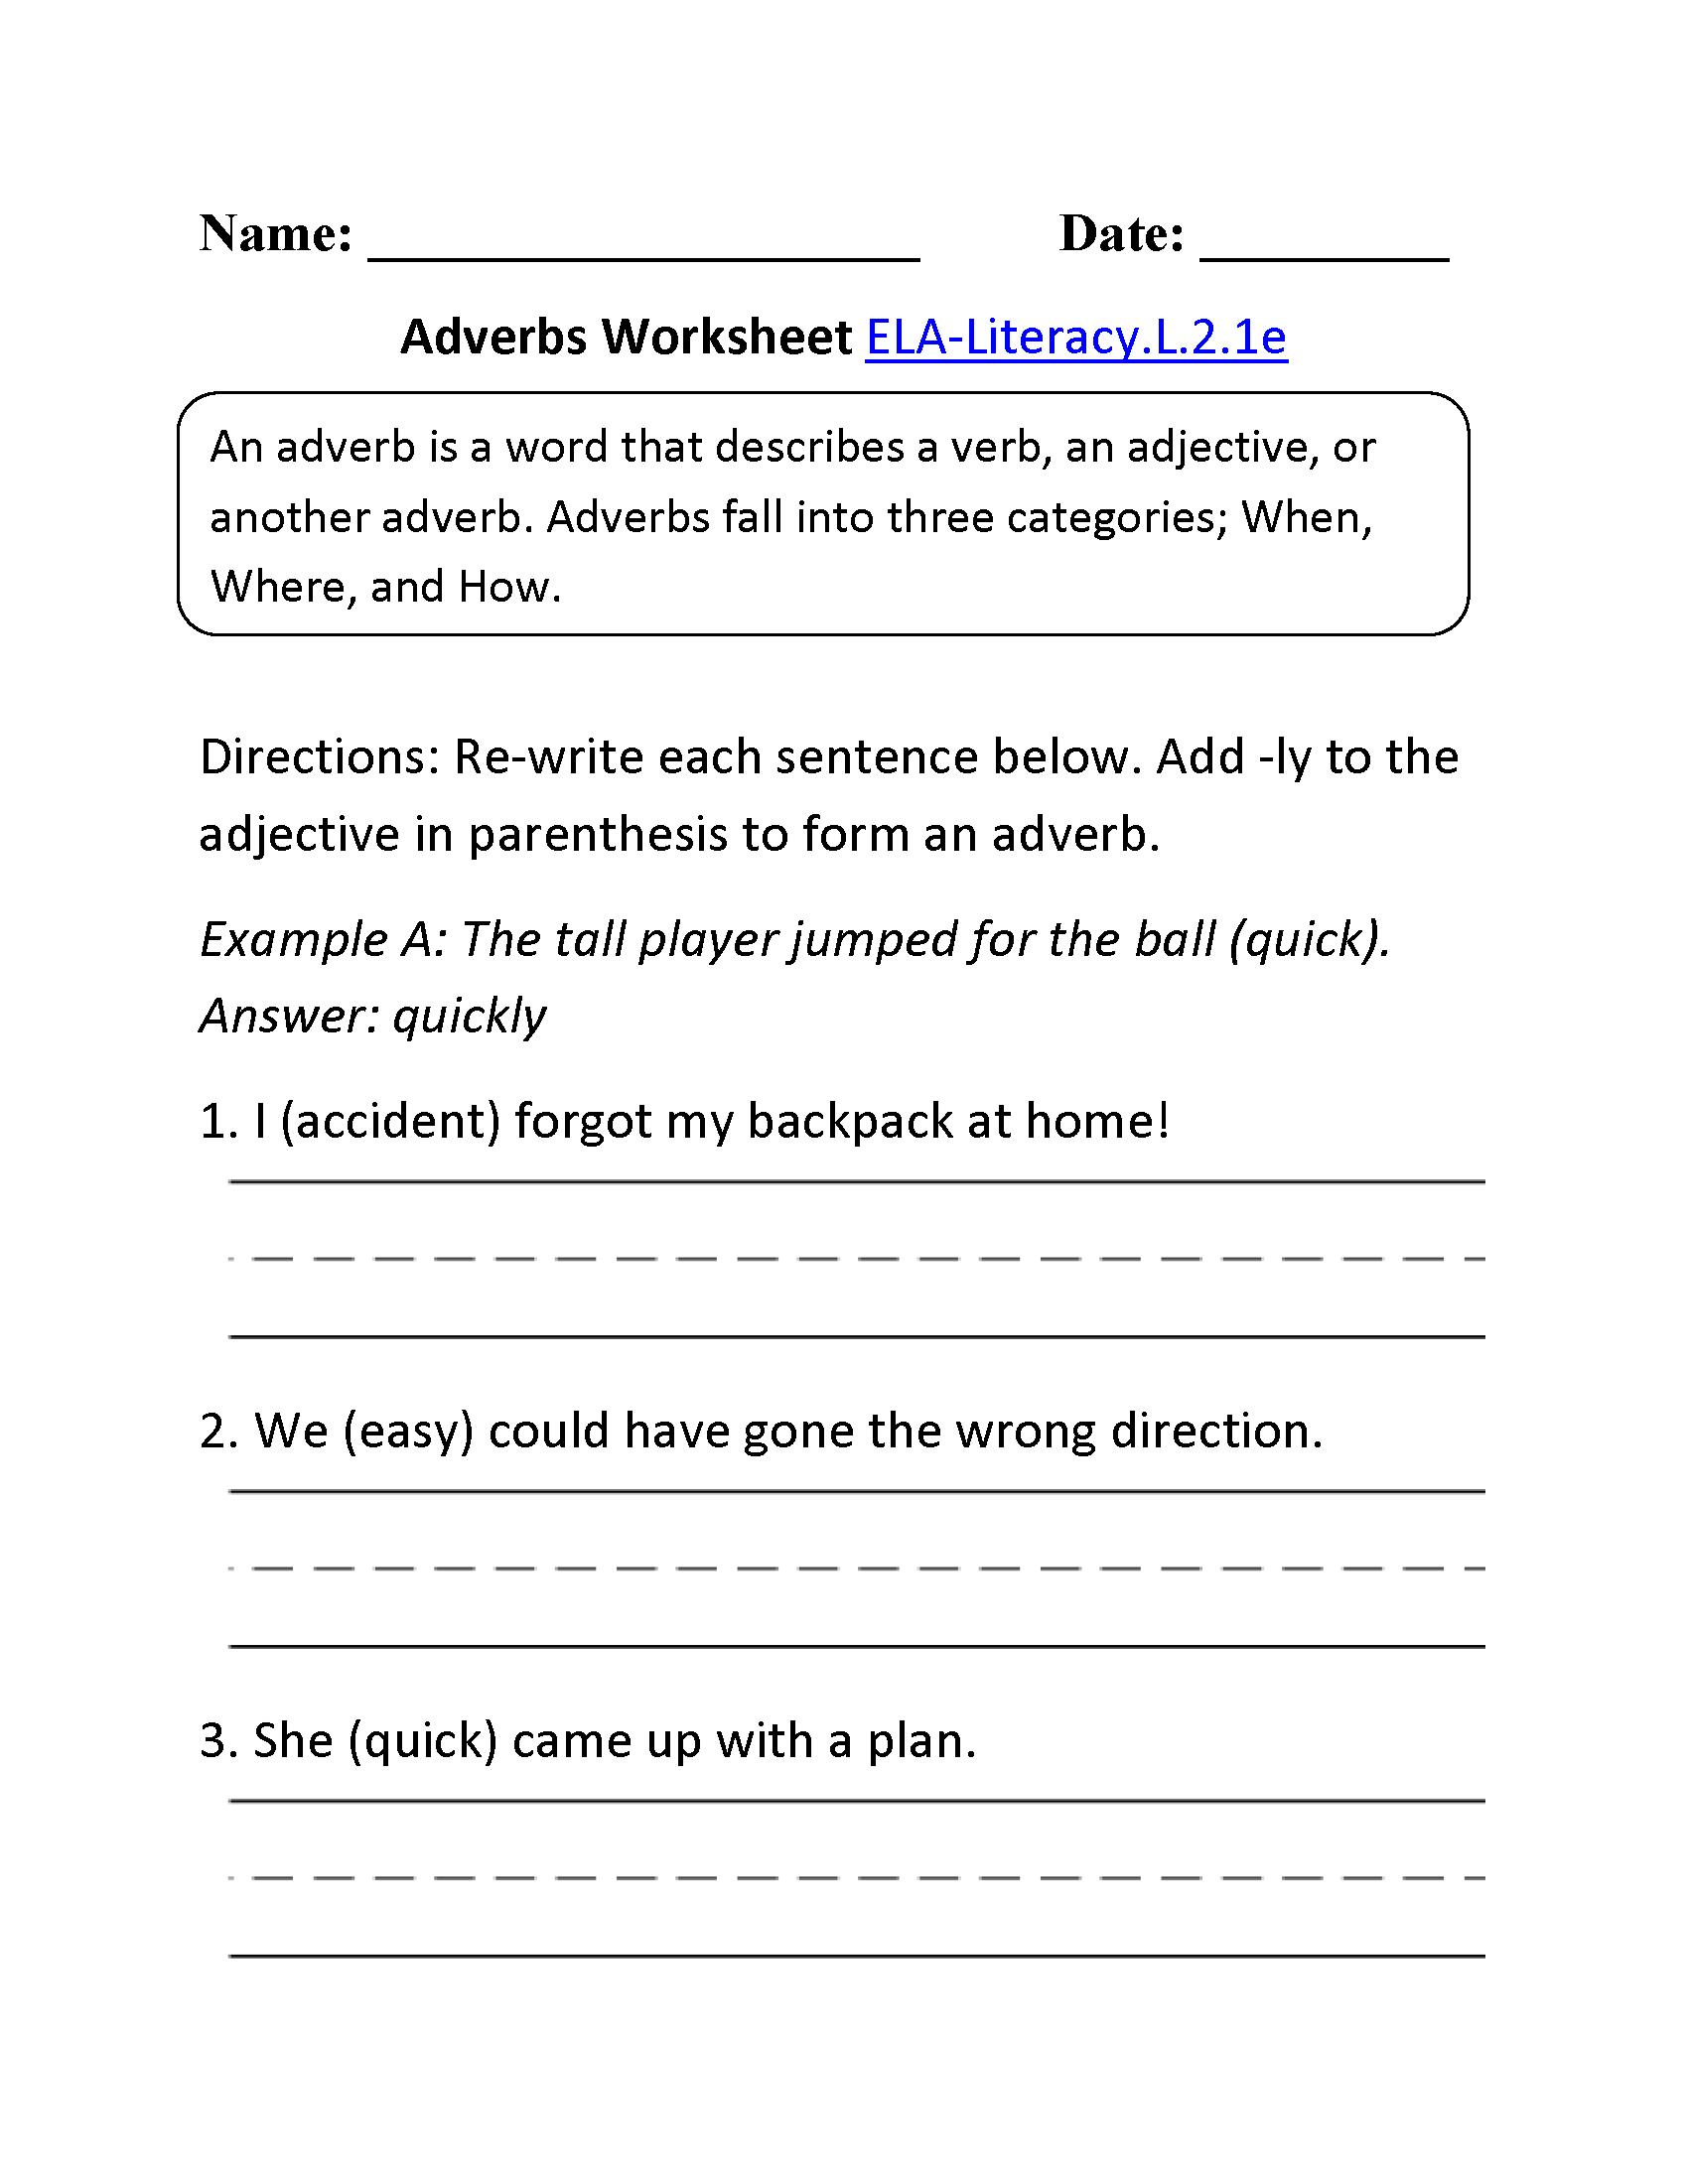 Adverbs Worksheet 2 ELA-Literacy.L.2.1e Language Worksheet   Language  worksheets [ 2200 x 1700 Pixel ]